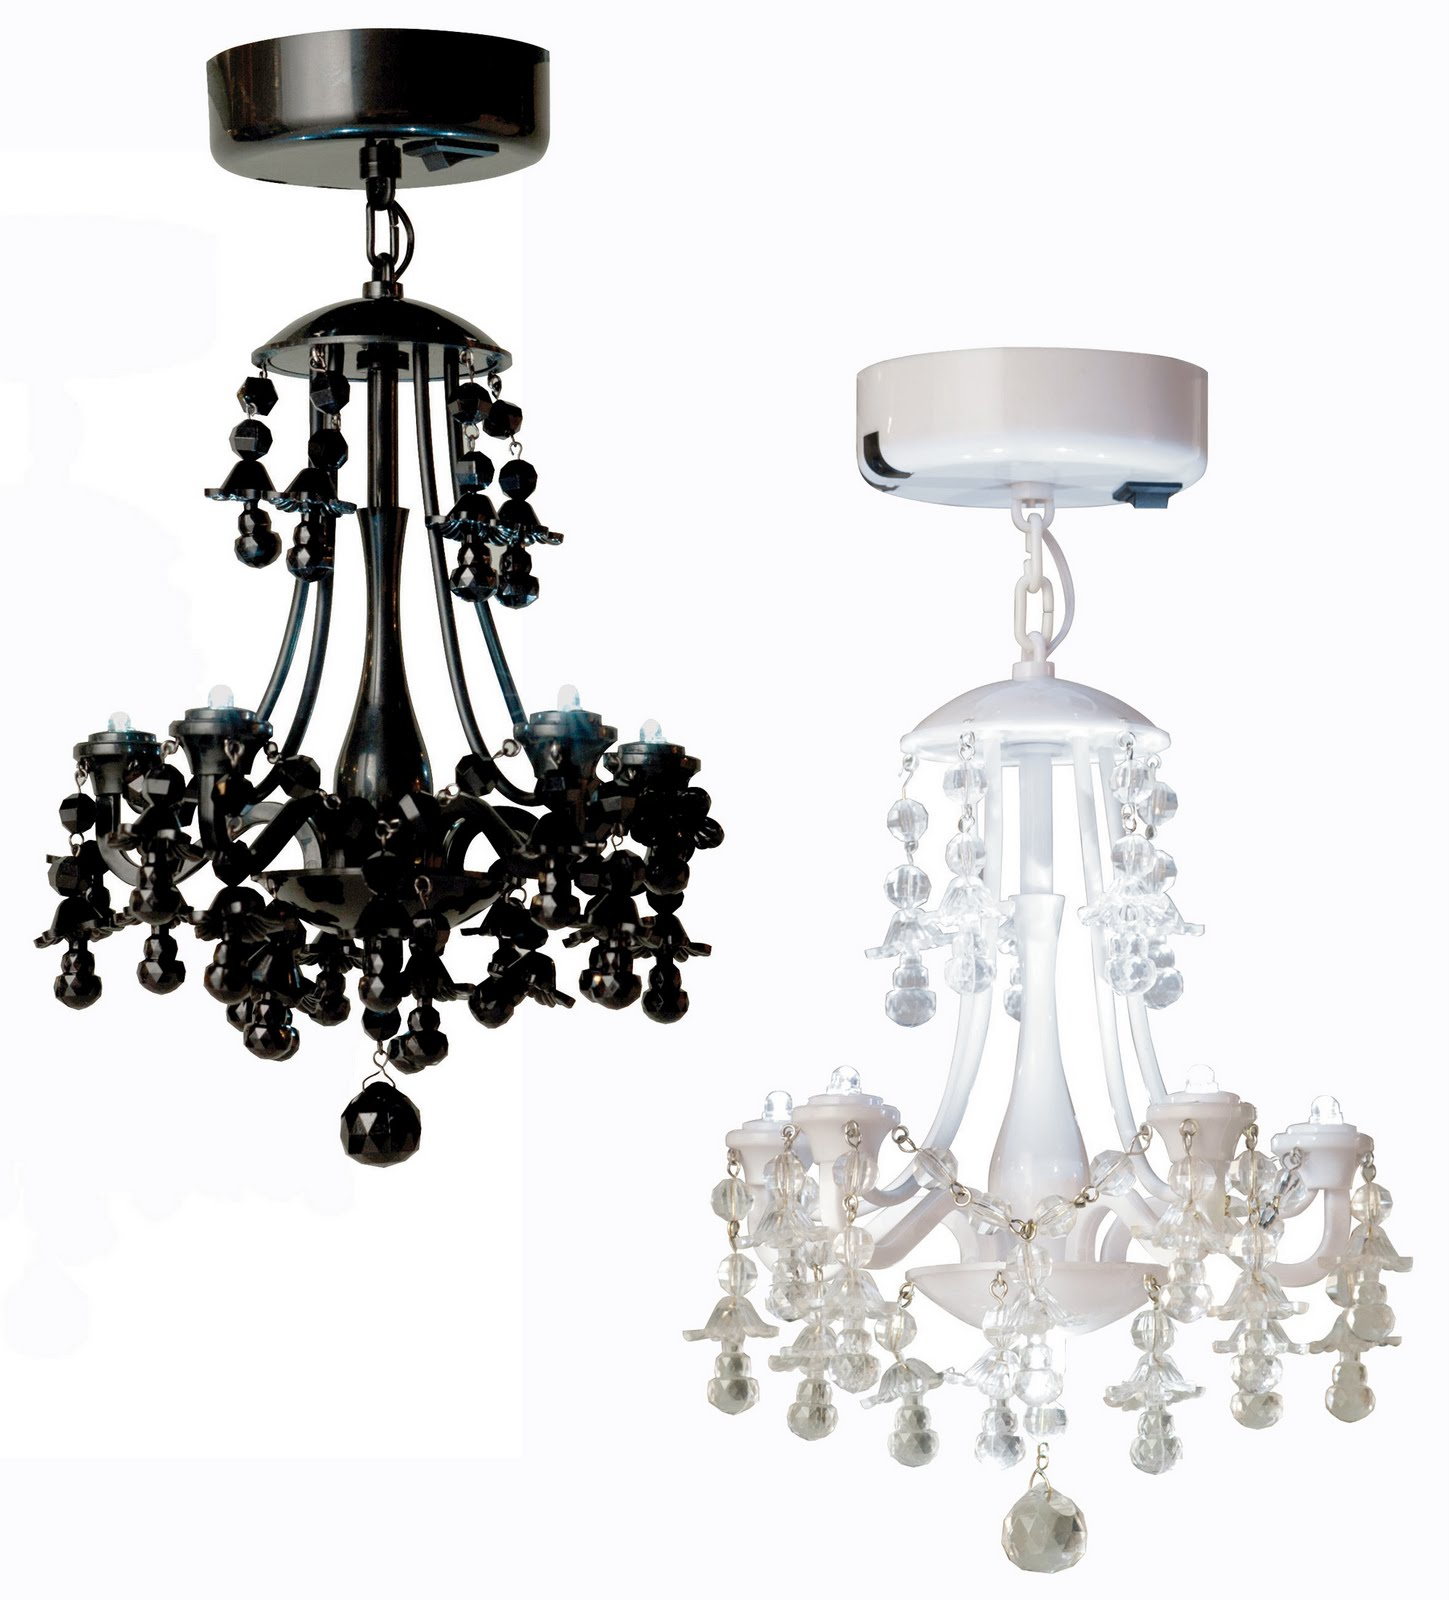 Wonderful chandelier locker light walmart gallery simple design sophisticated chandelier locker light target images simple design arubaitofo Image collections